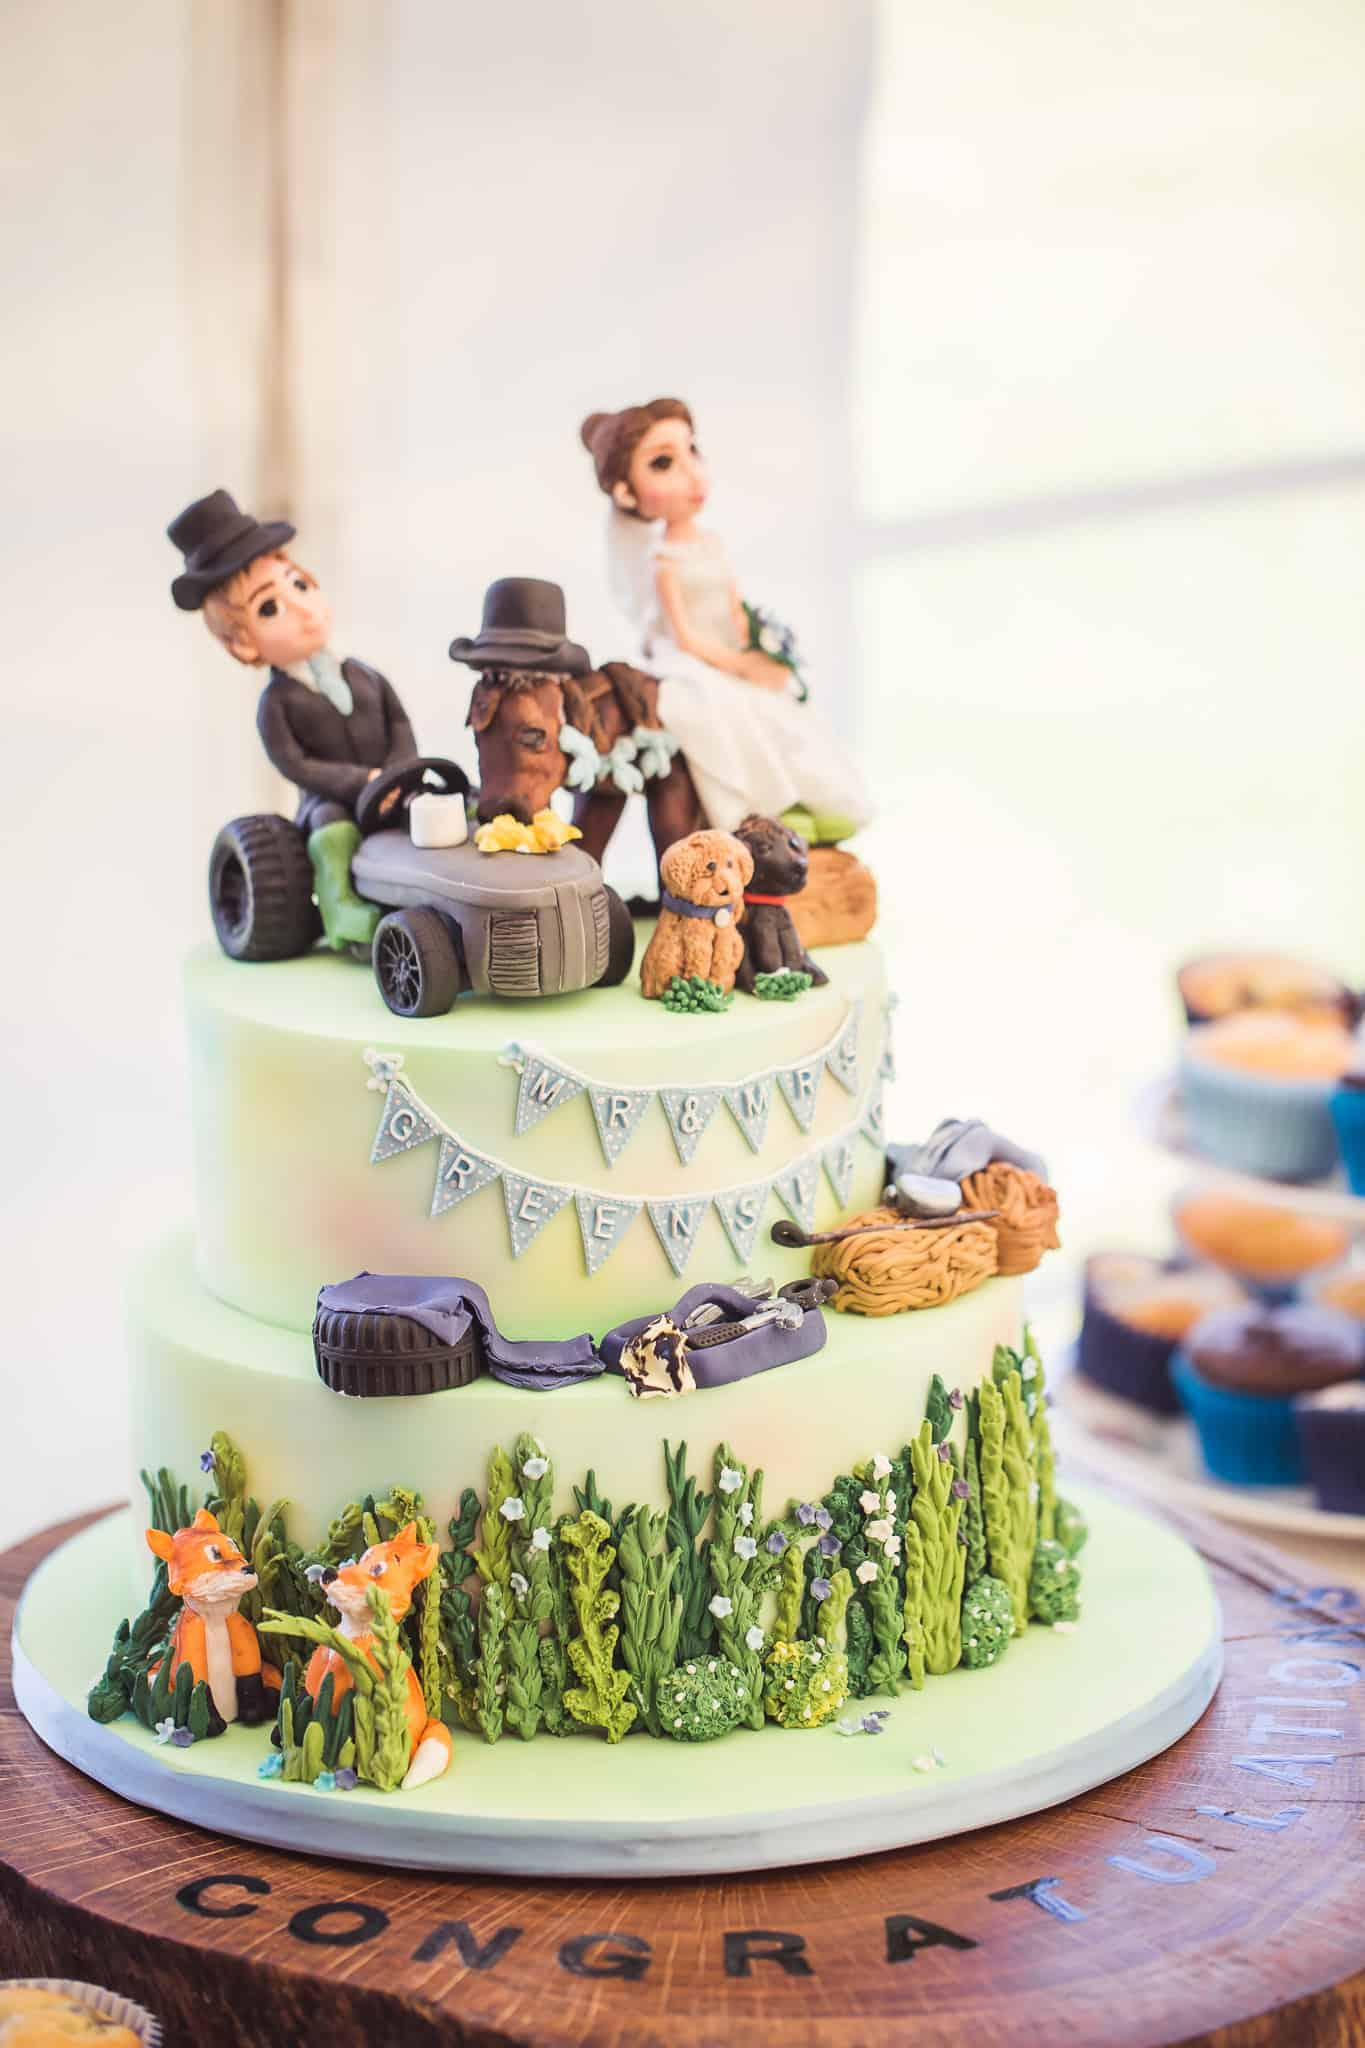 Catherine-George-Wedding-Cannington-Bridgwater-Somerset-Katie-Mortimore-Photography-small-257